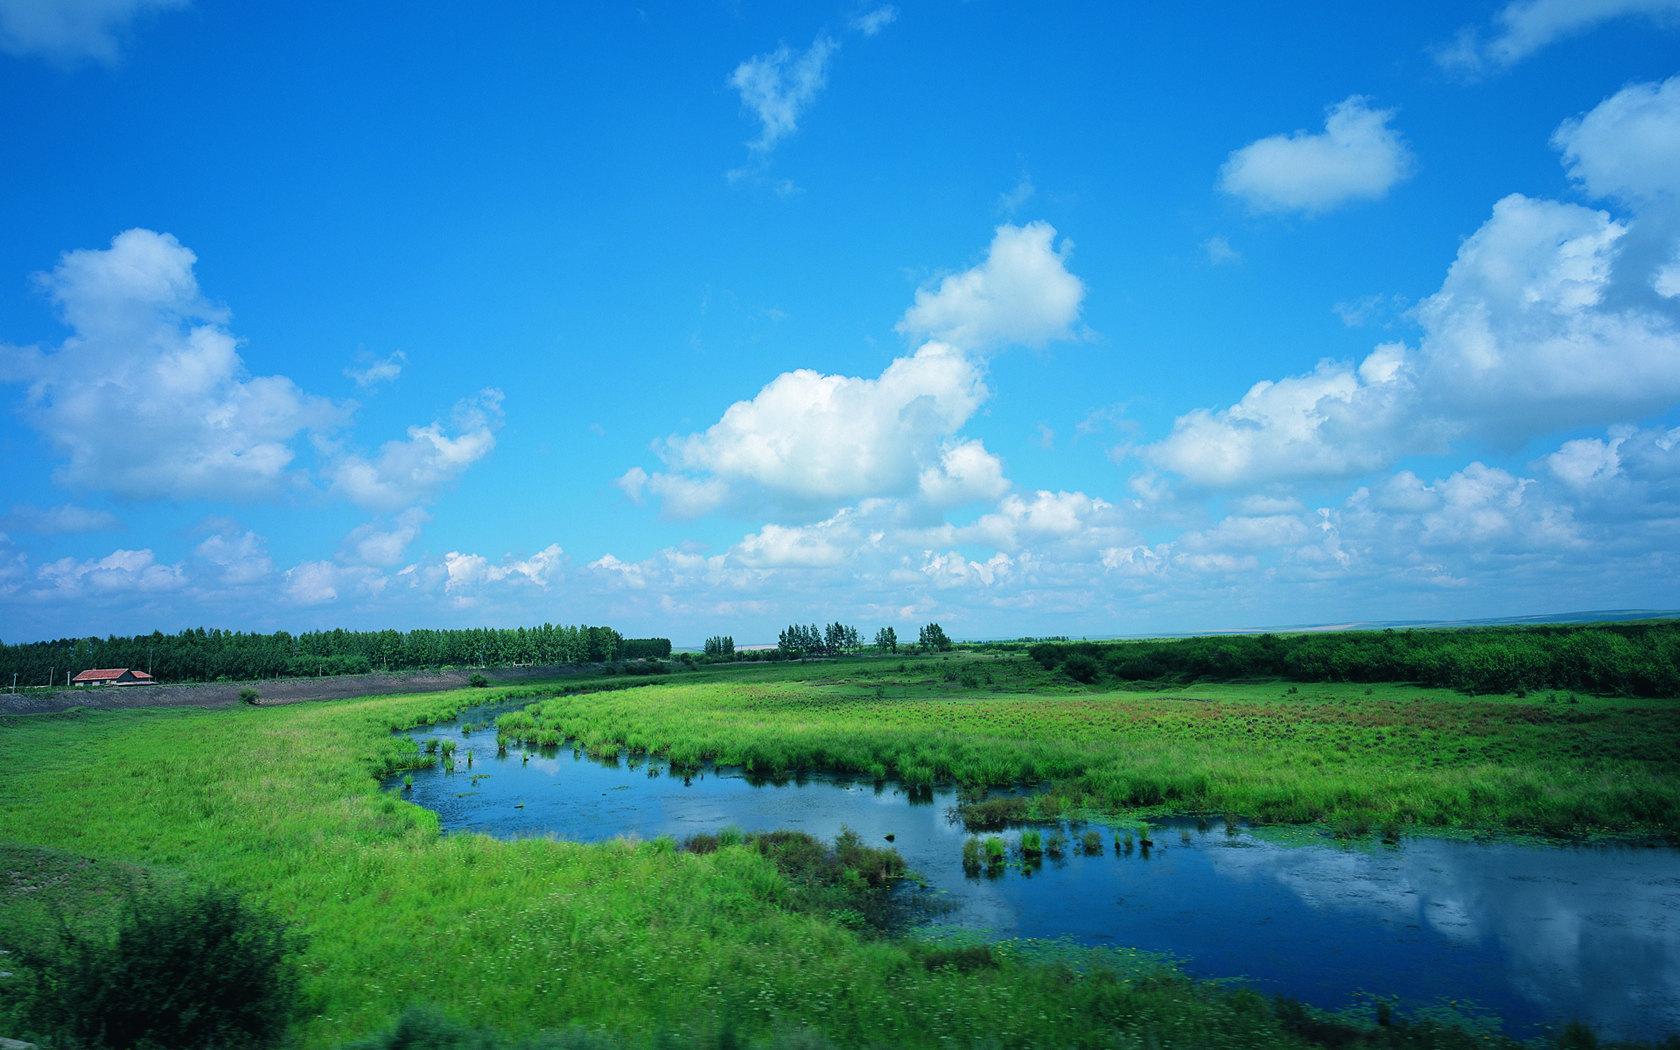 Blue landscape scenery